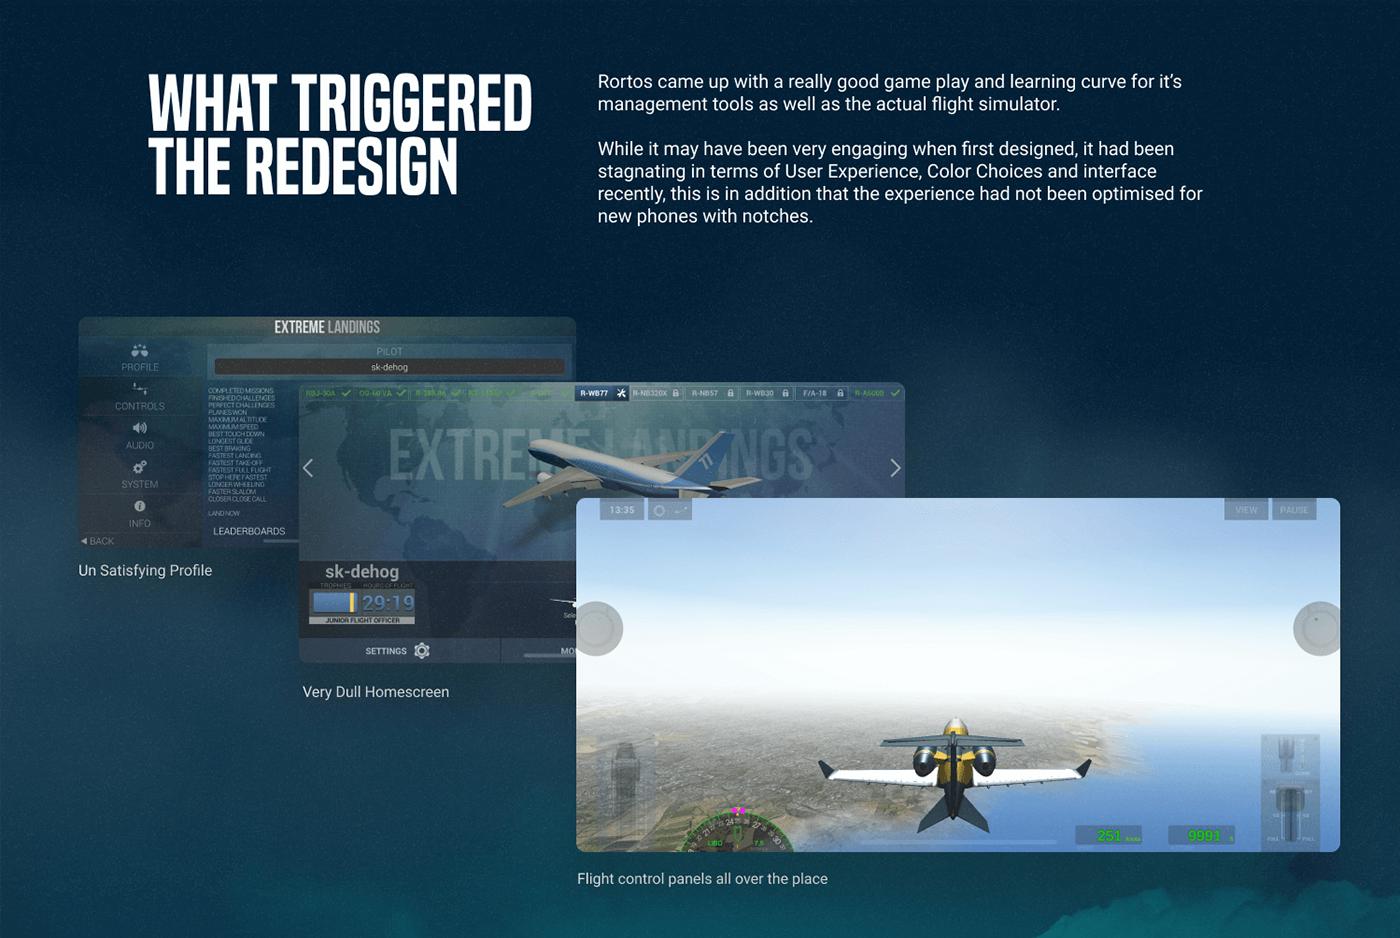 Image may contain: aircraft and airplane